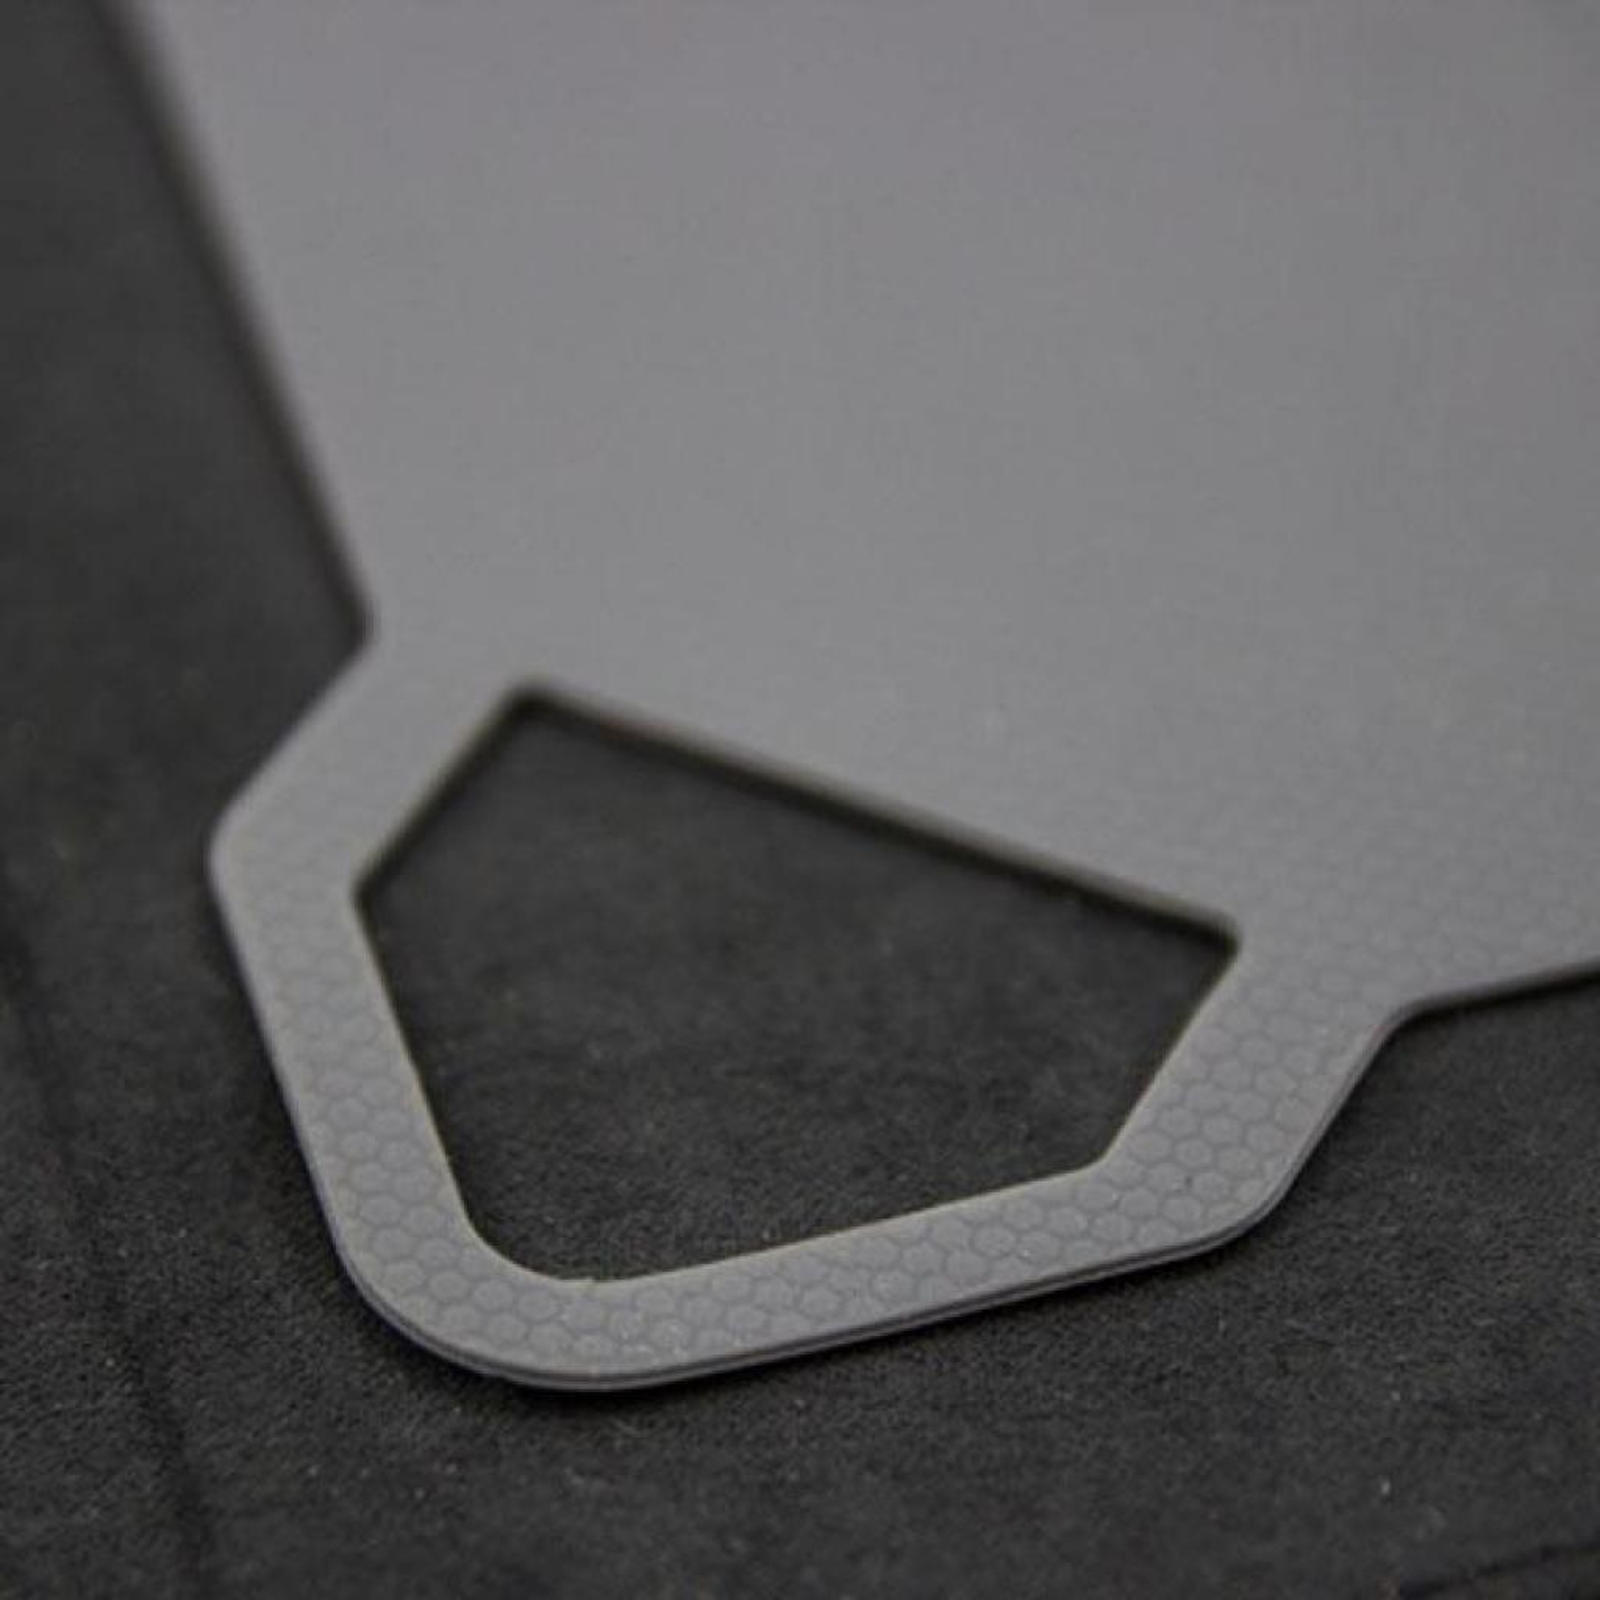 Чехол для планшета BRASKA TAB-7 (7504X) black (BRS7L7504BK) изображение 4